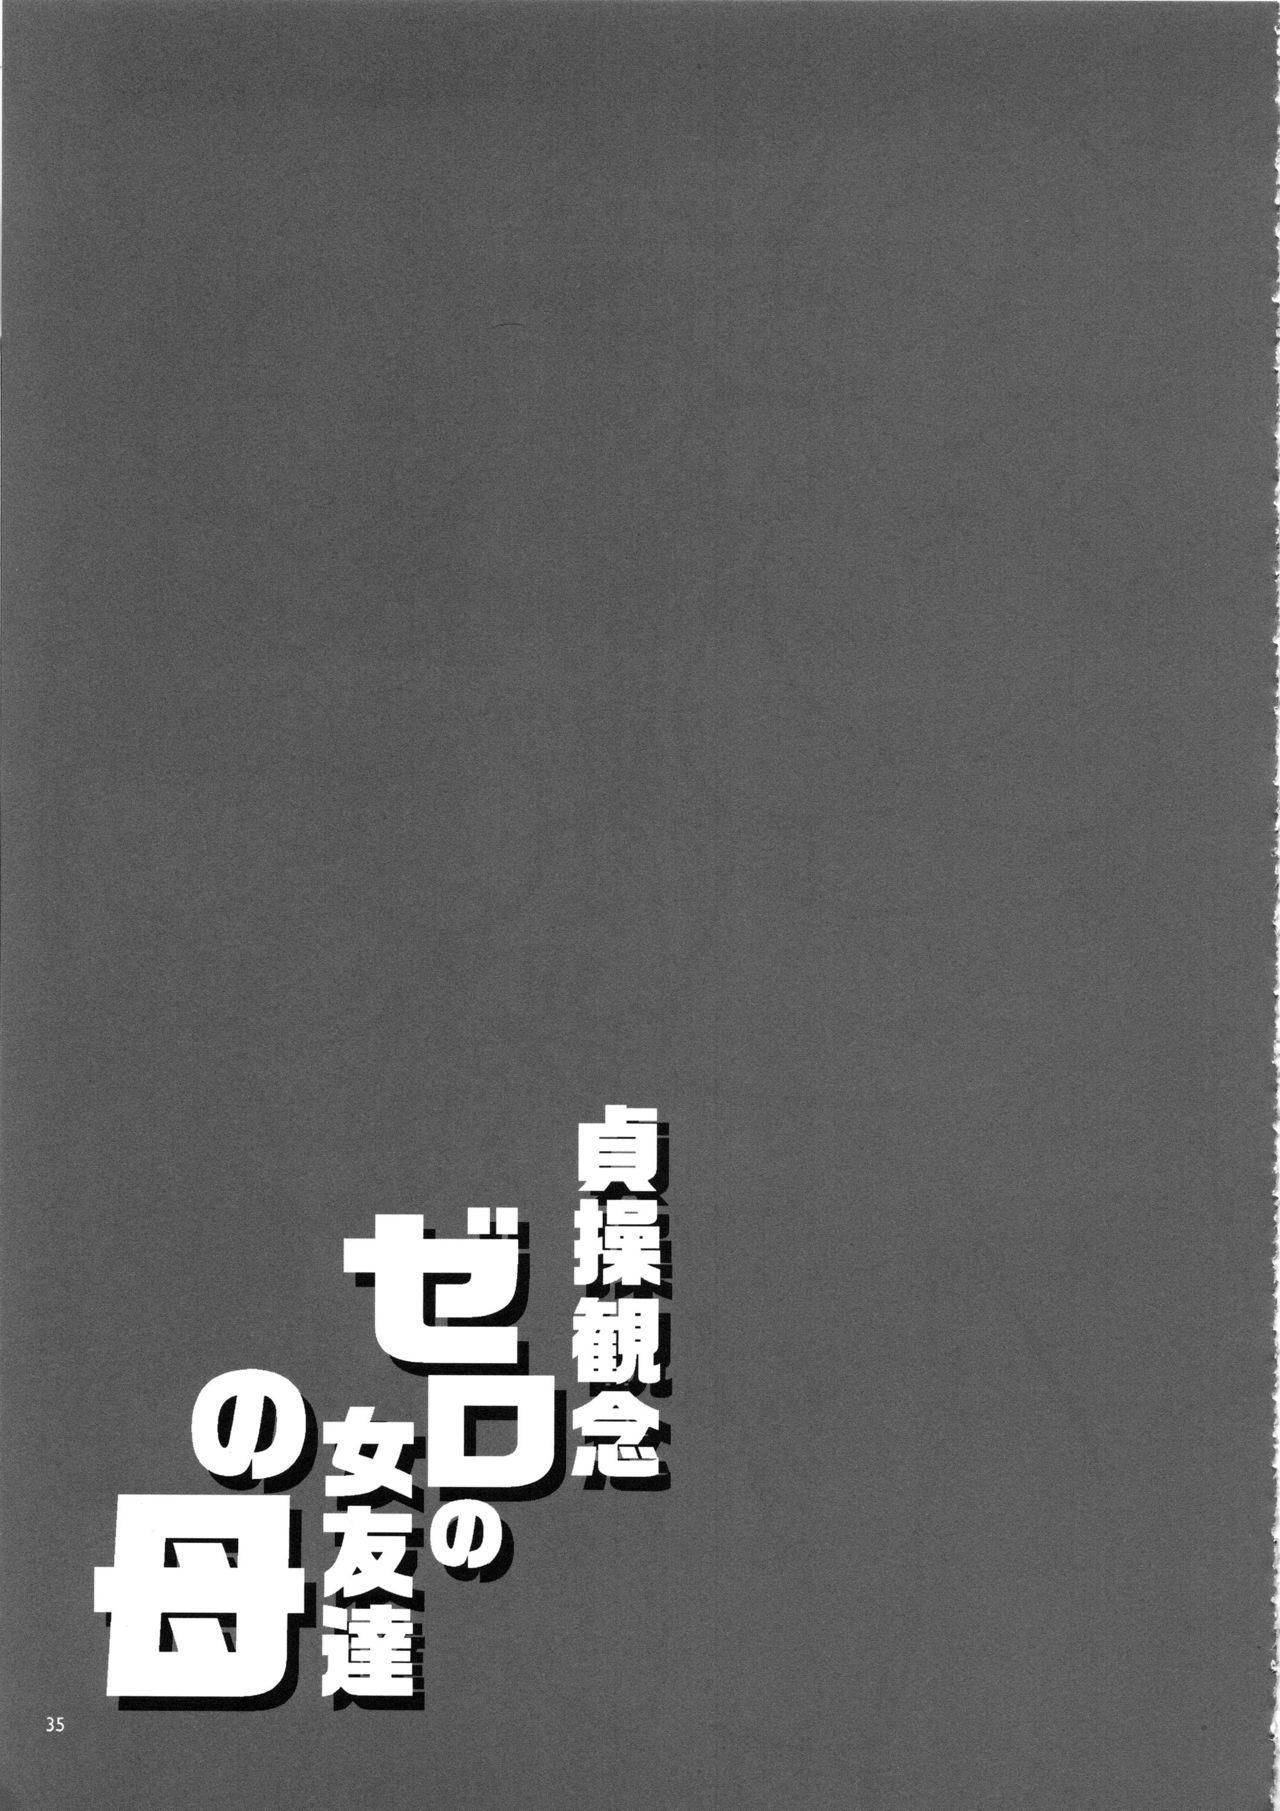 Teisou Kannen Zero no Onna Tomodachi no Haha 33